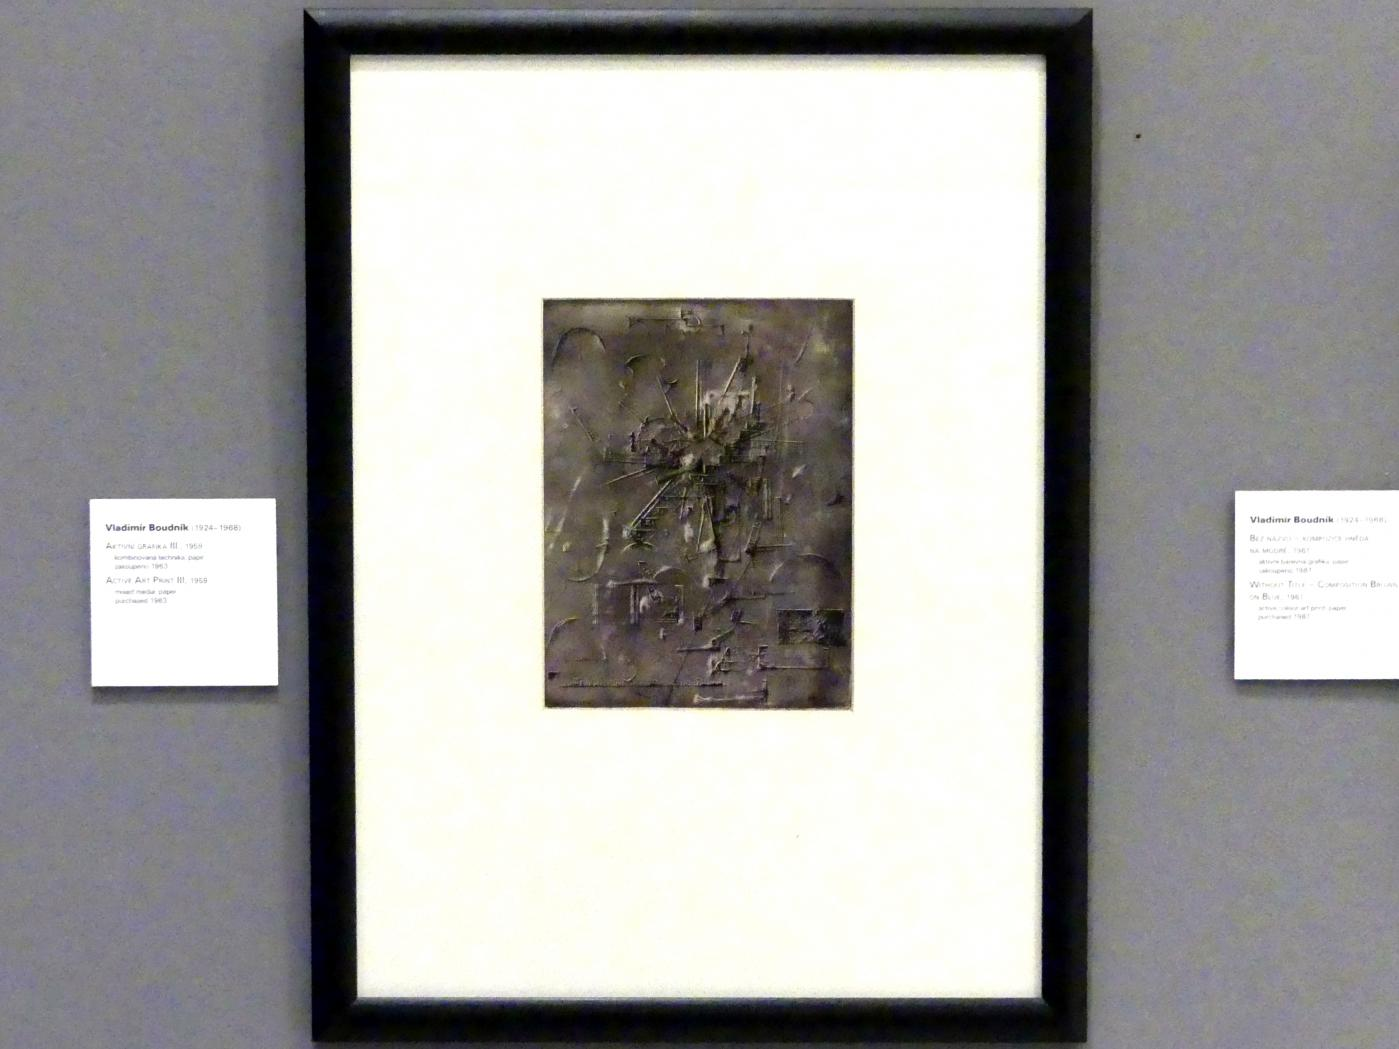 Vladimír Boudník: Aktiver Kunstdruck III, 1959